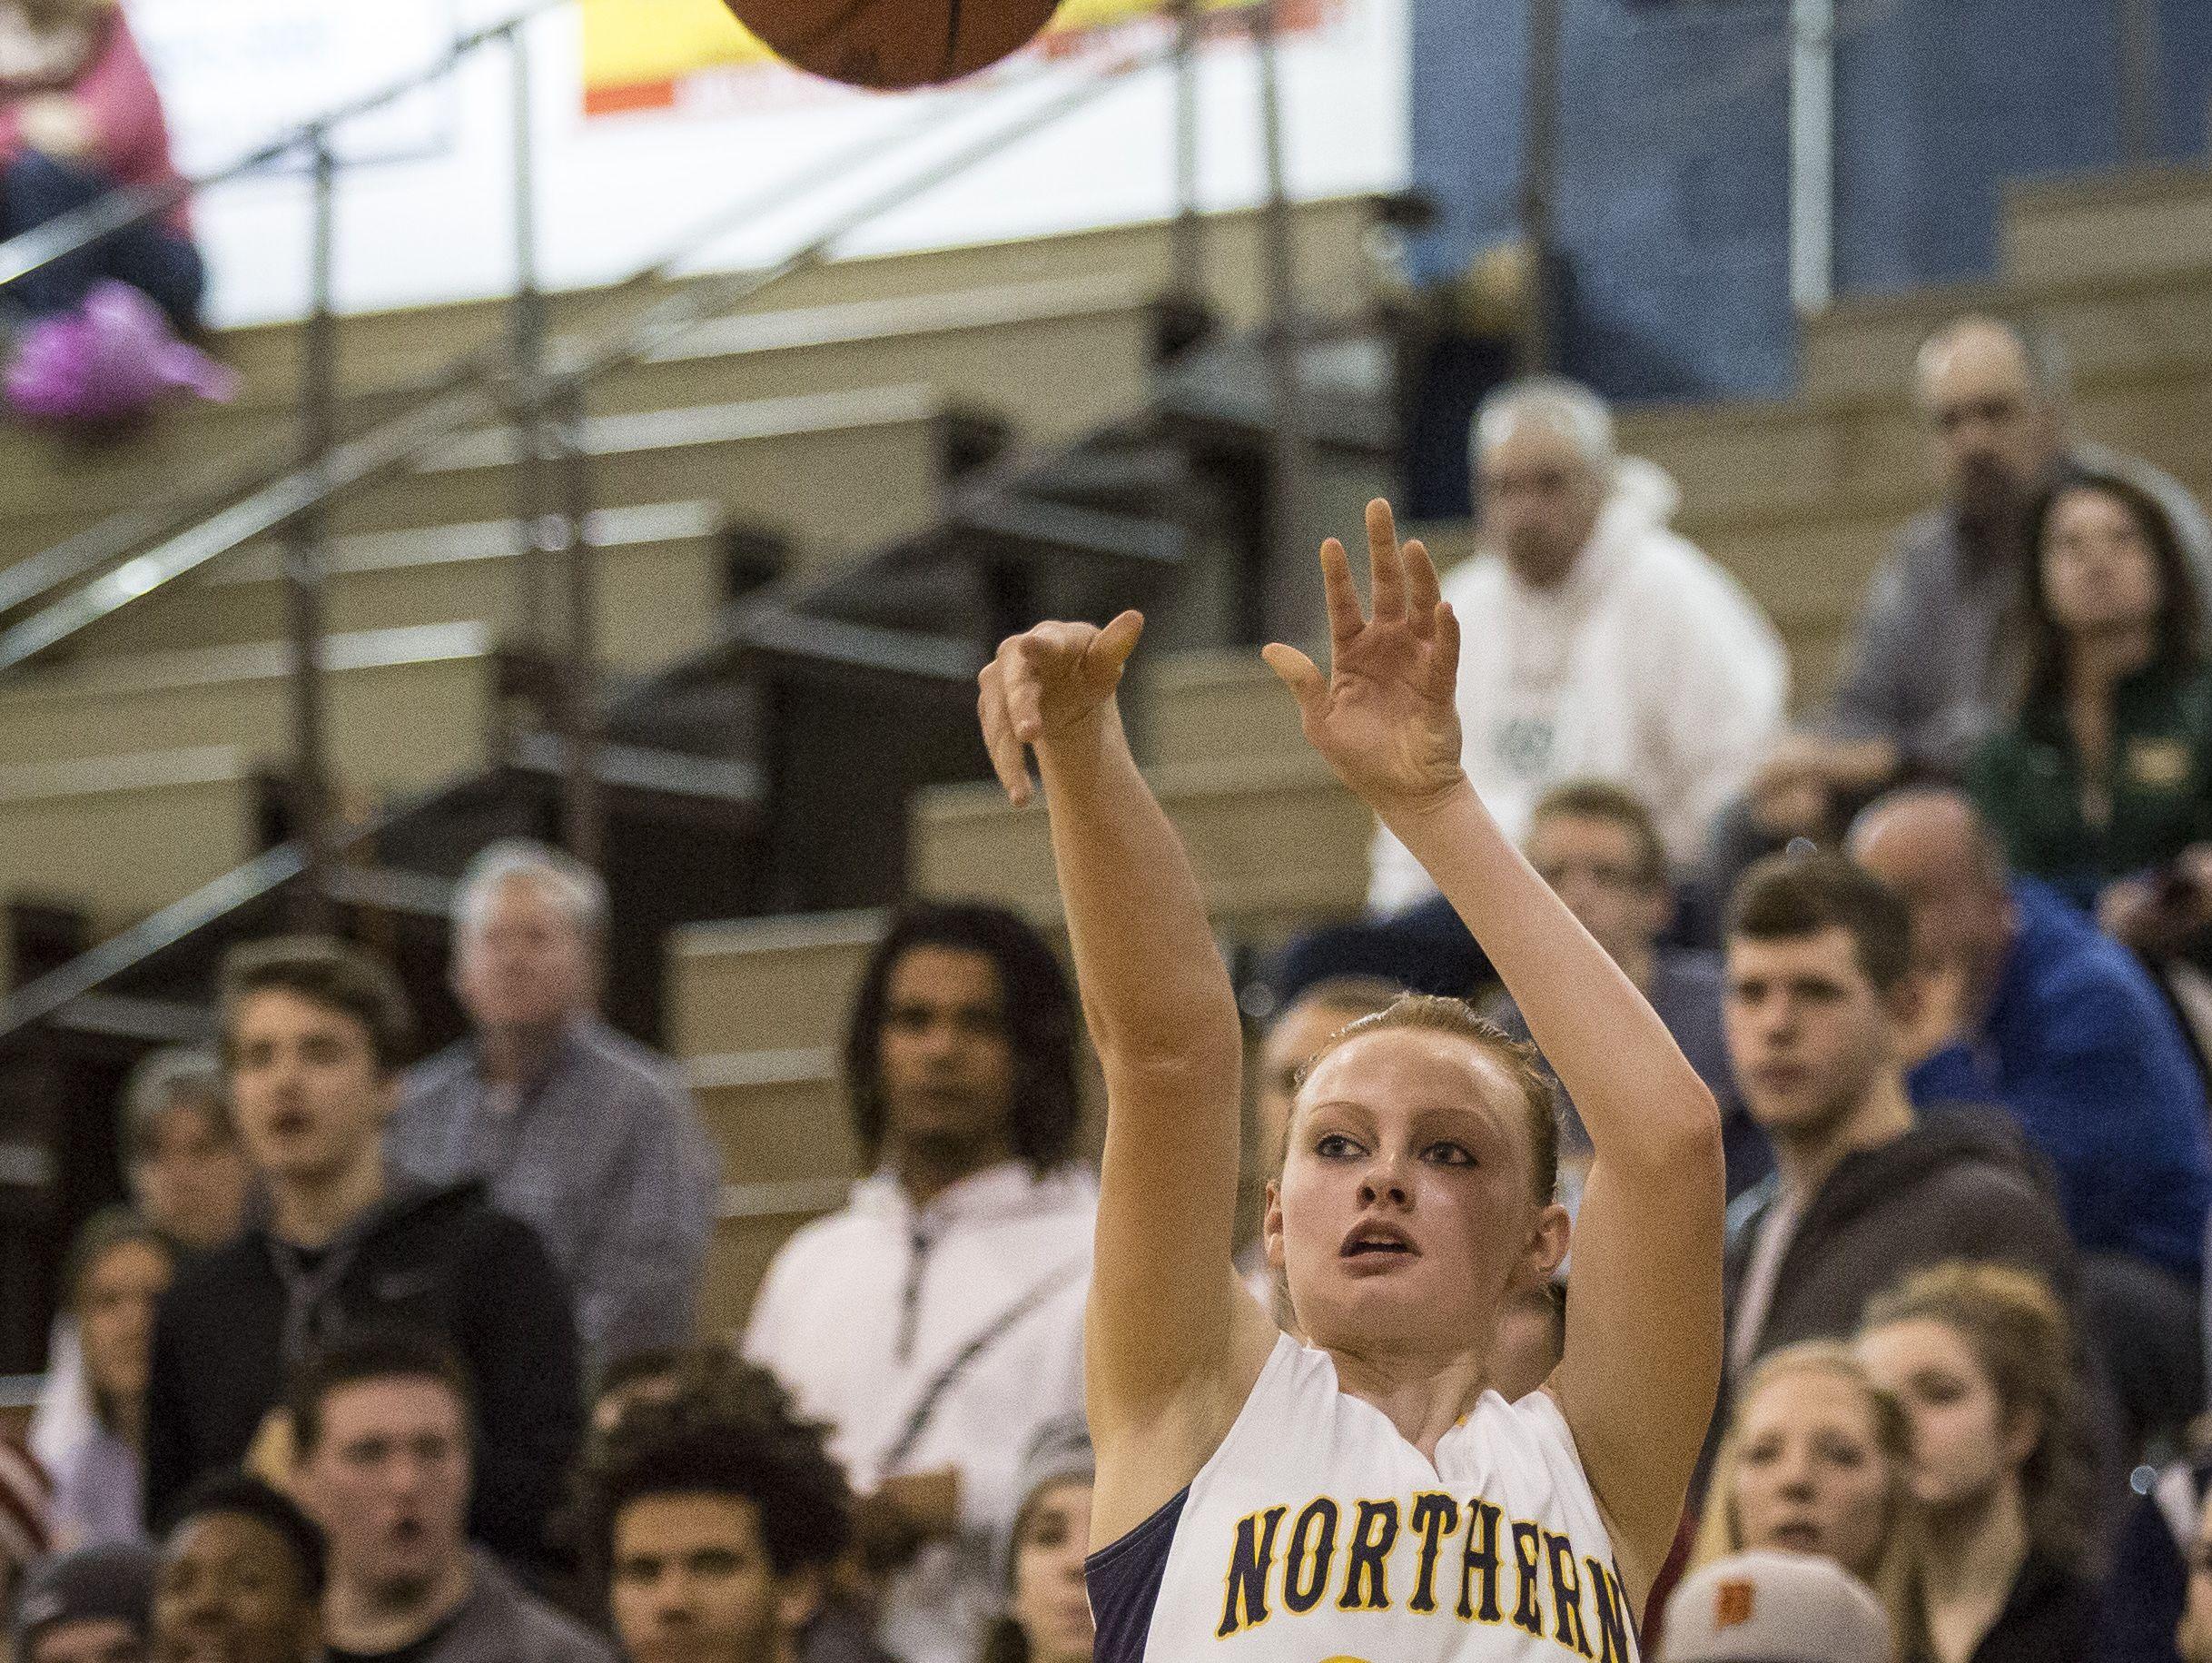 Port Huron Northern junior Kendyl Keyes takes a shot during a basketball game Friday, Feb. 19, 2016 at Port Huron Northern High School.